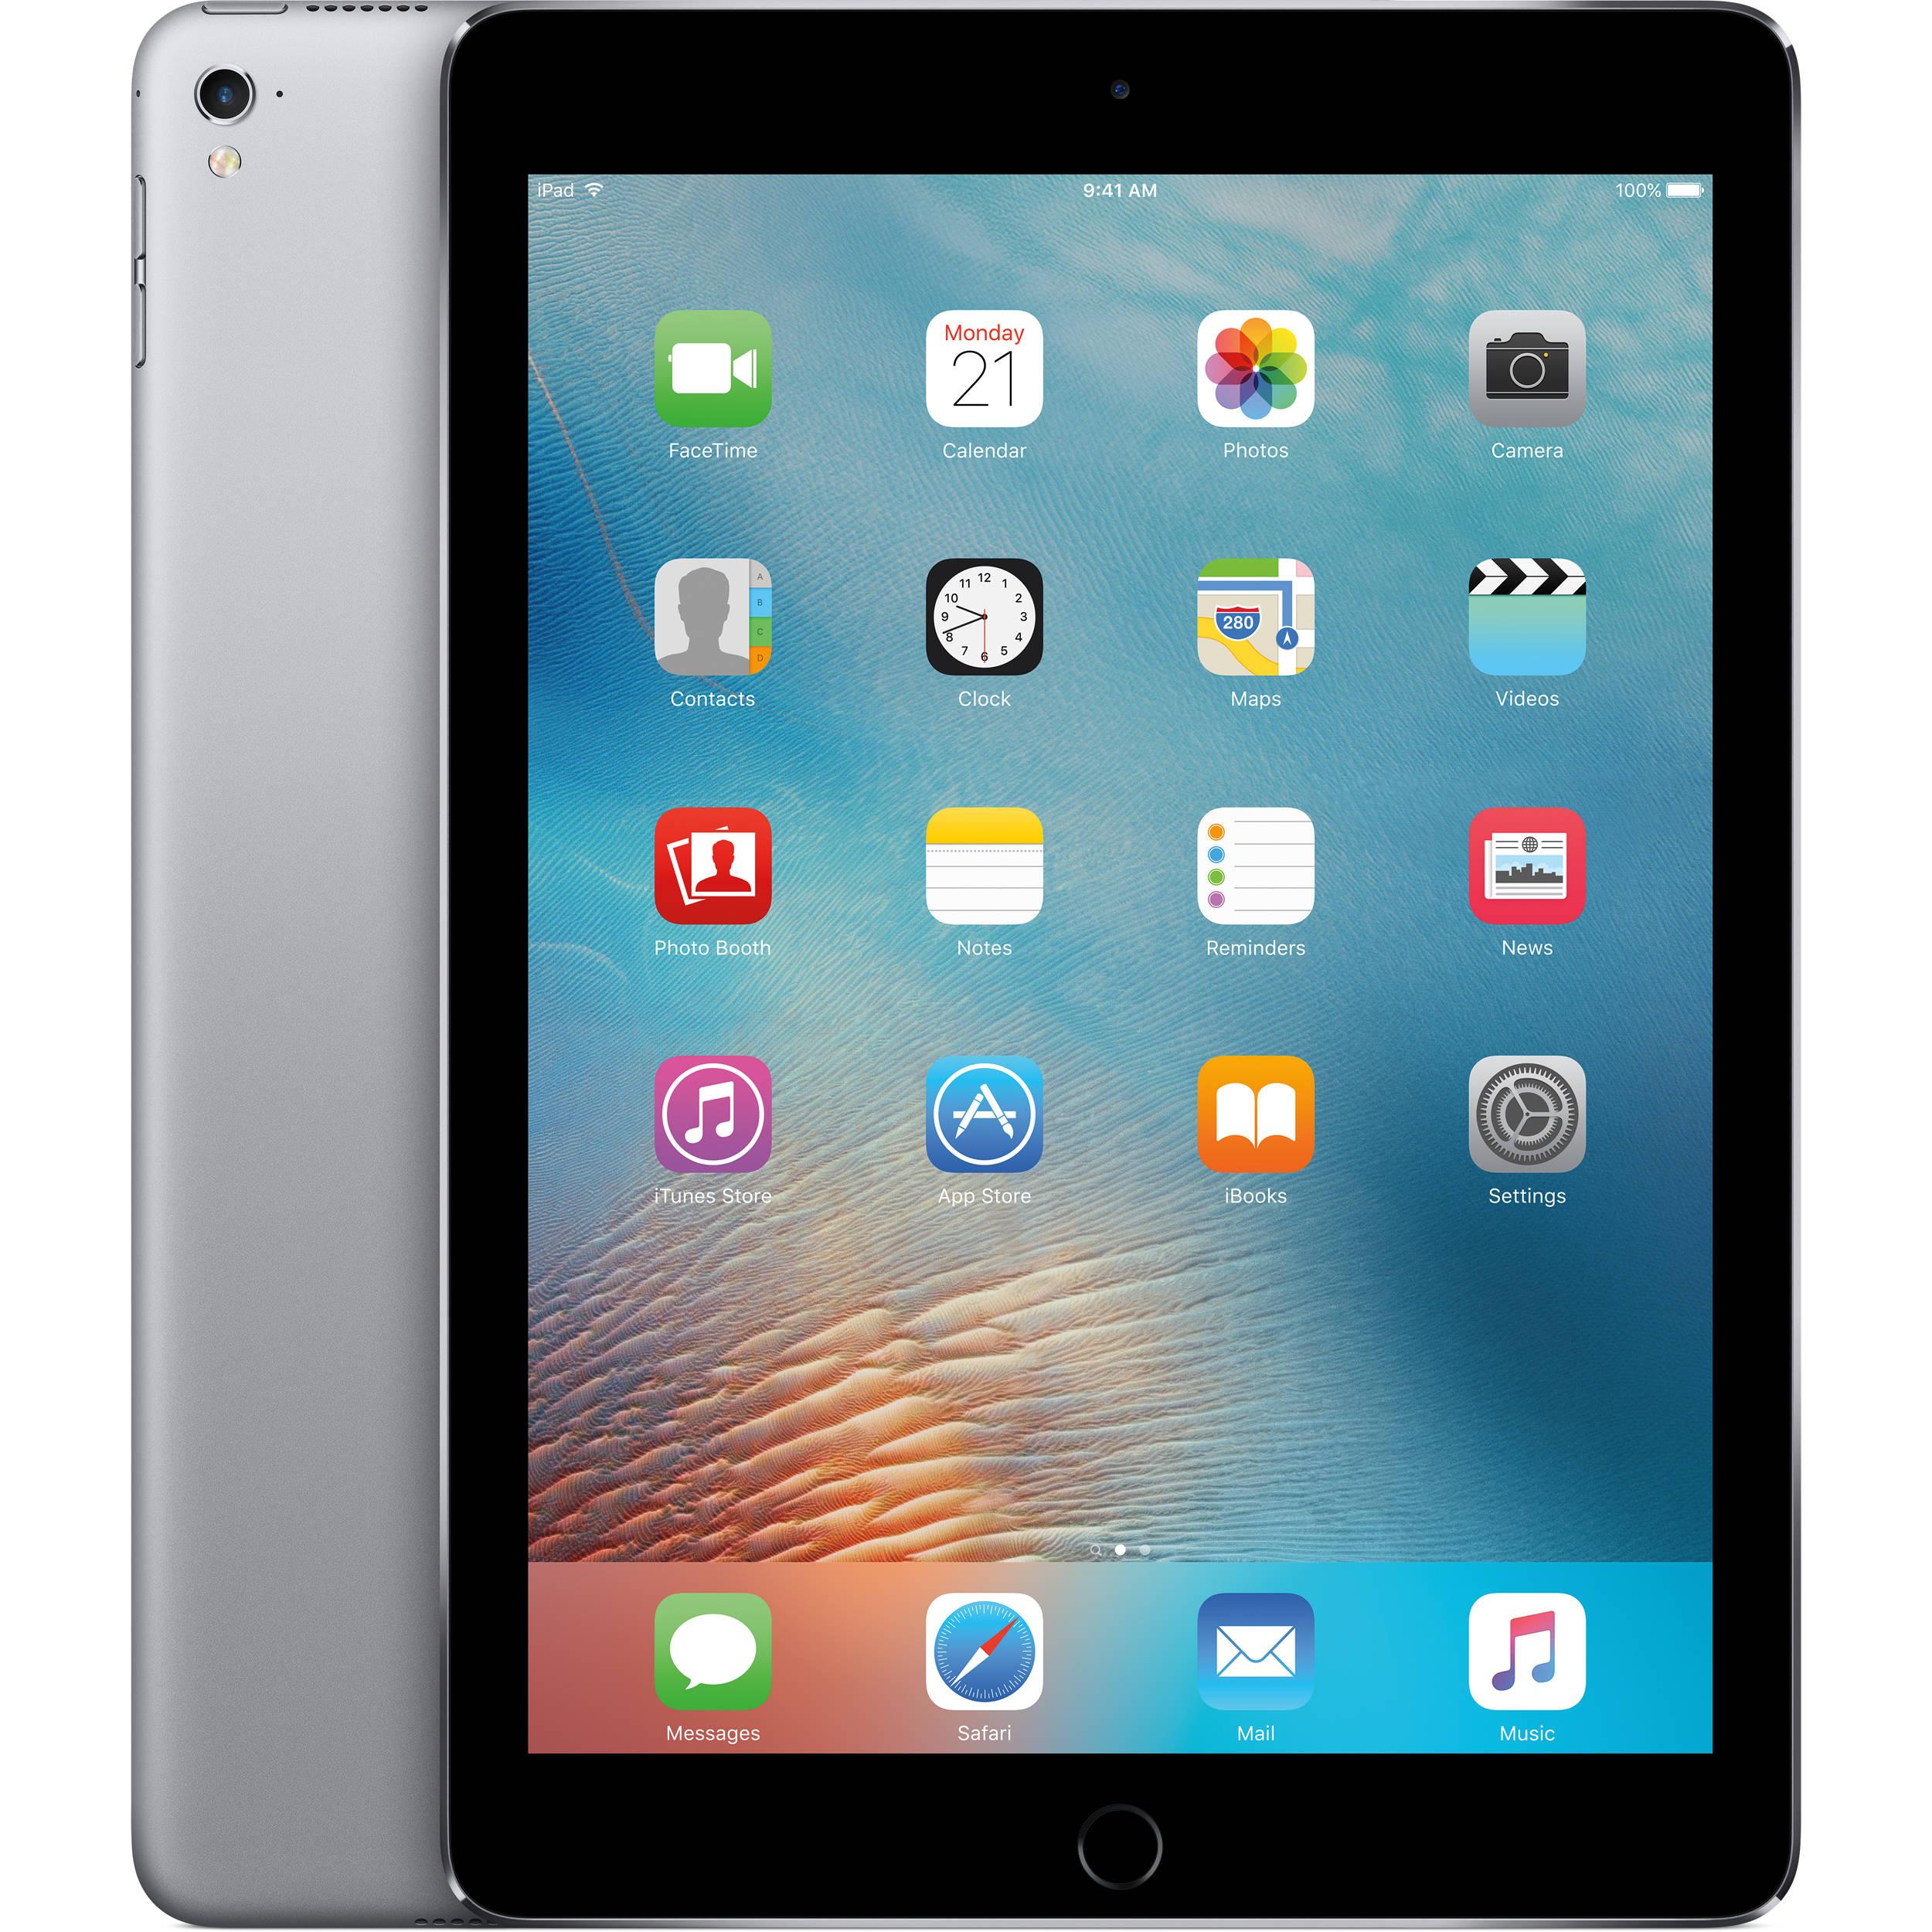 Apple iPad mini 4 WIFI 128gb grey für 379 € bei eBay